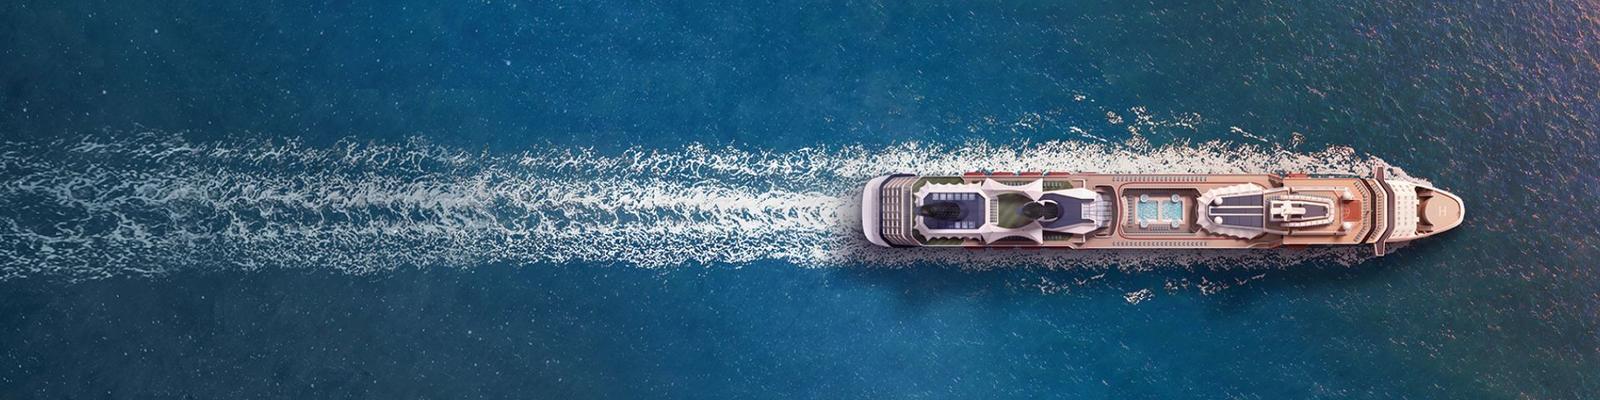 Celebrity Revolution is Celebrity Cruise Line's $500 million refurbishment program (Image: Celebrity Cruises)